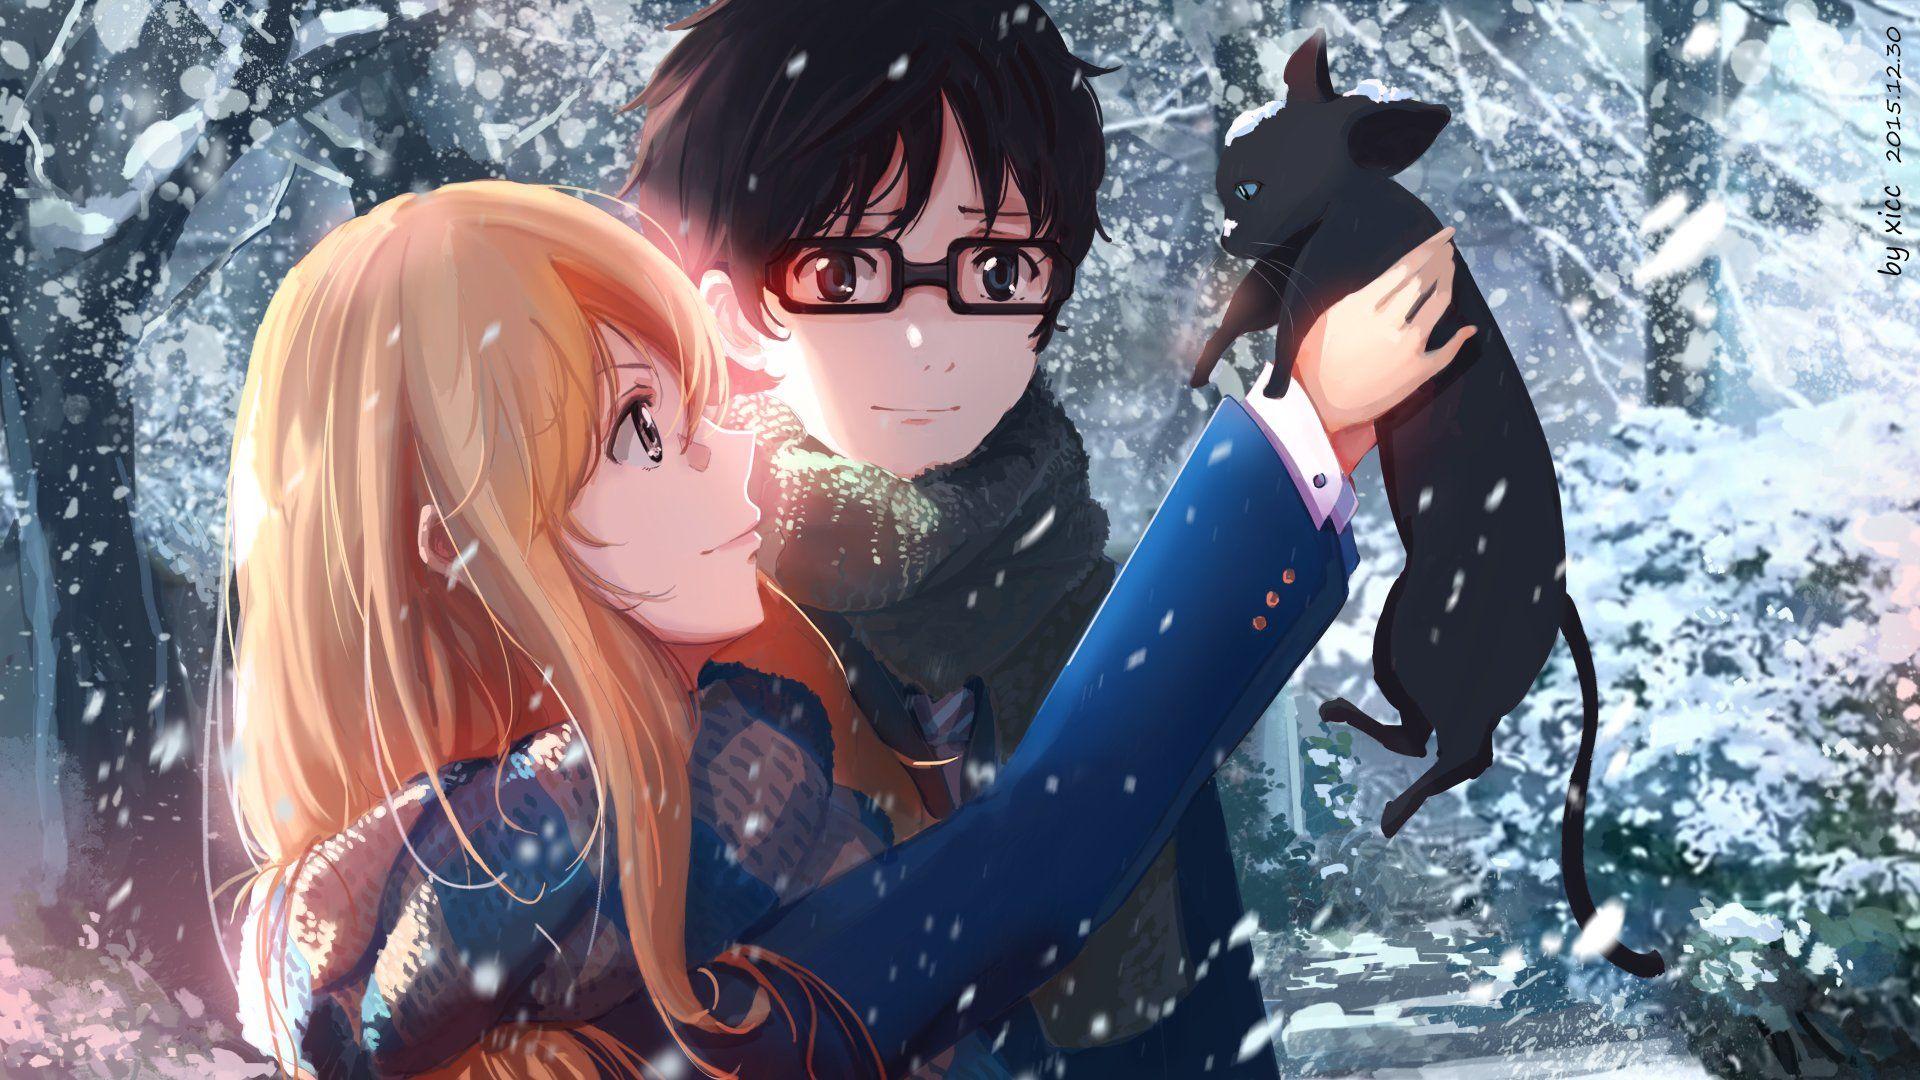 Anime Your Lie In April Cat Kaori Miyazono Kousei Arima Snow Anime Glasses Gi Papeis De Parede Animados Para Celular Casais Bonitos De Anime Animes Wallpapers